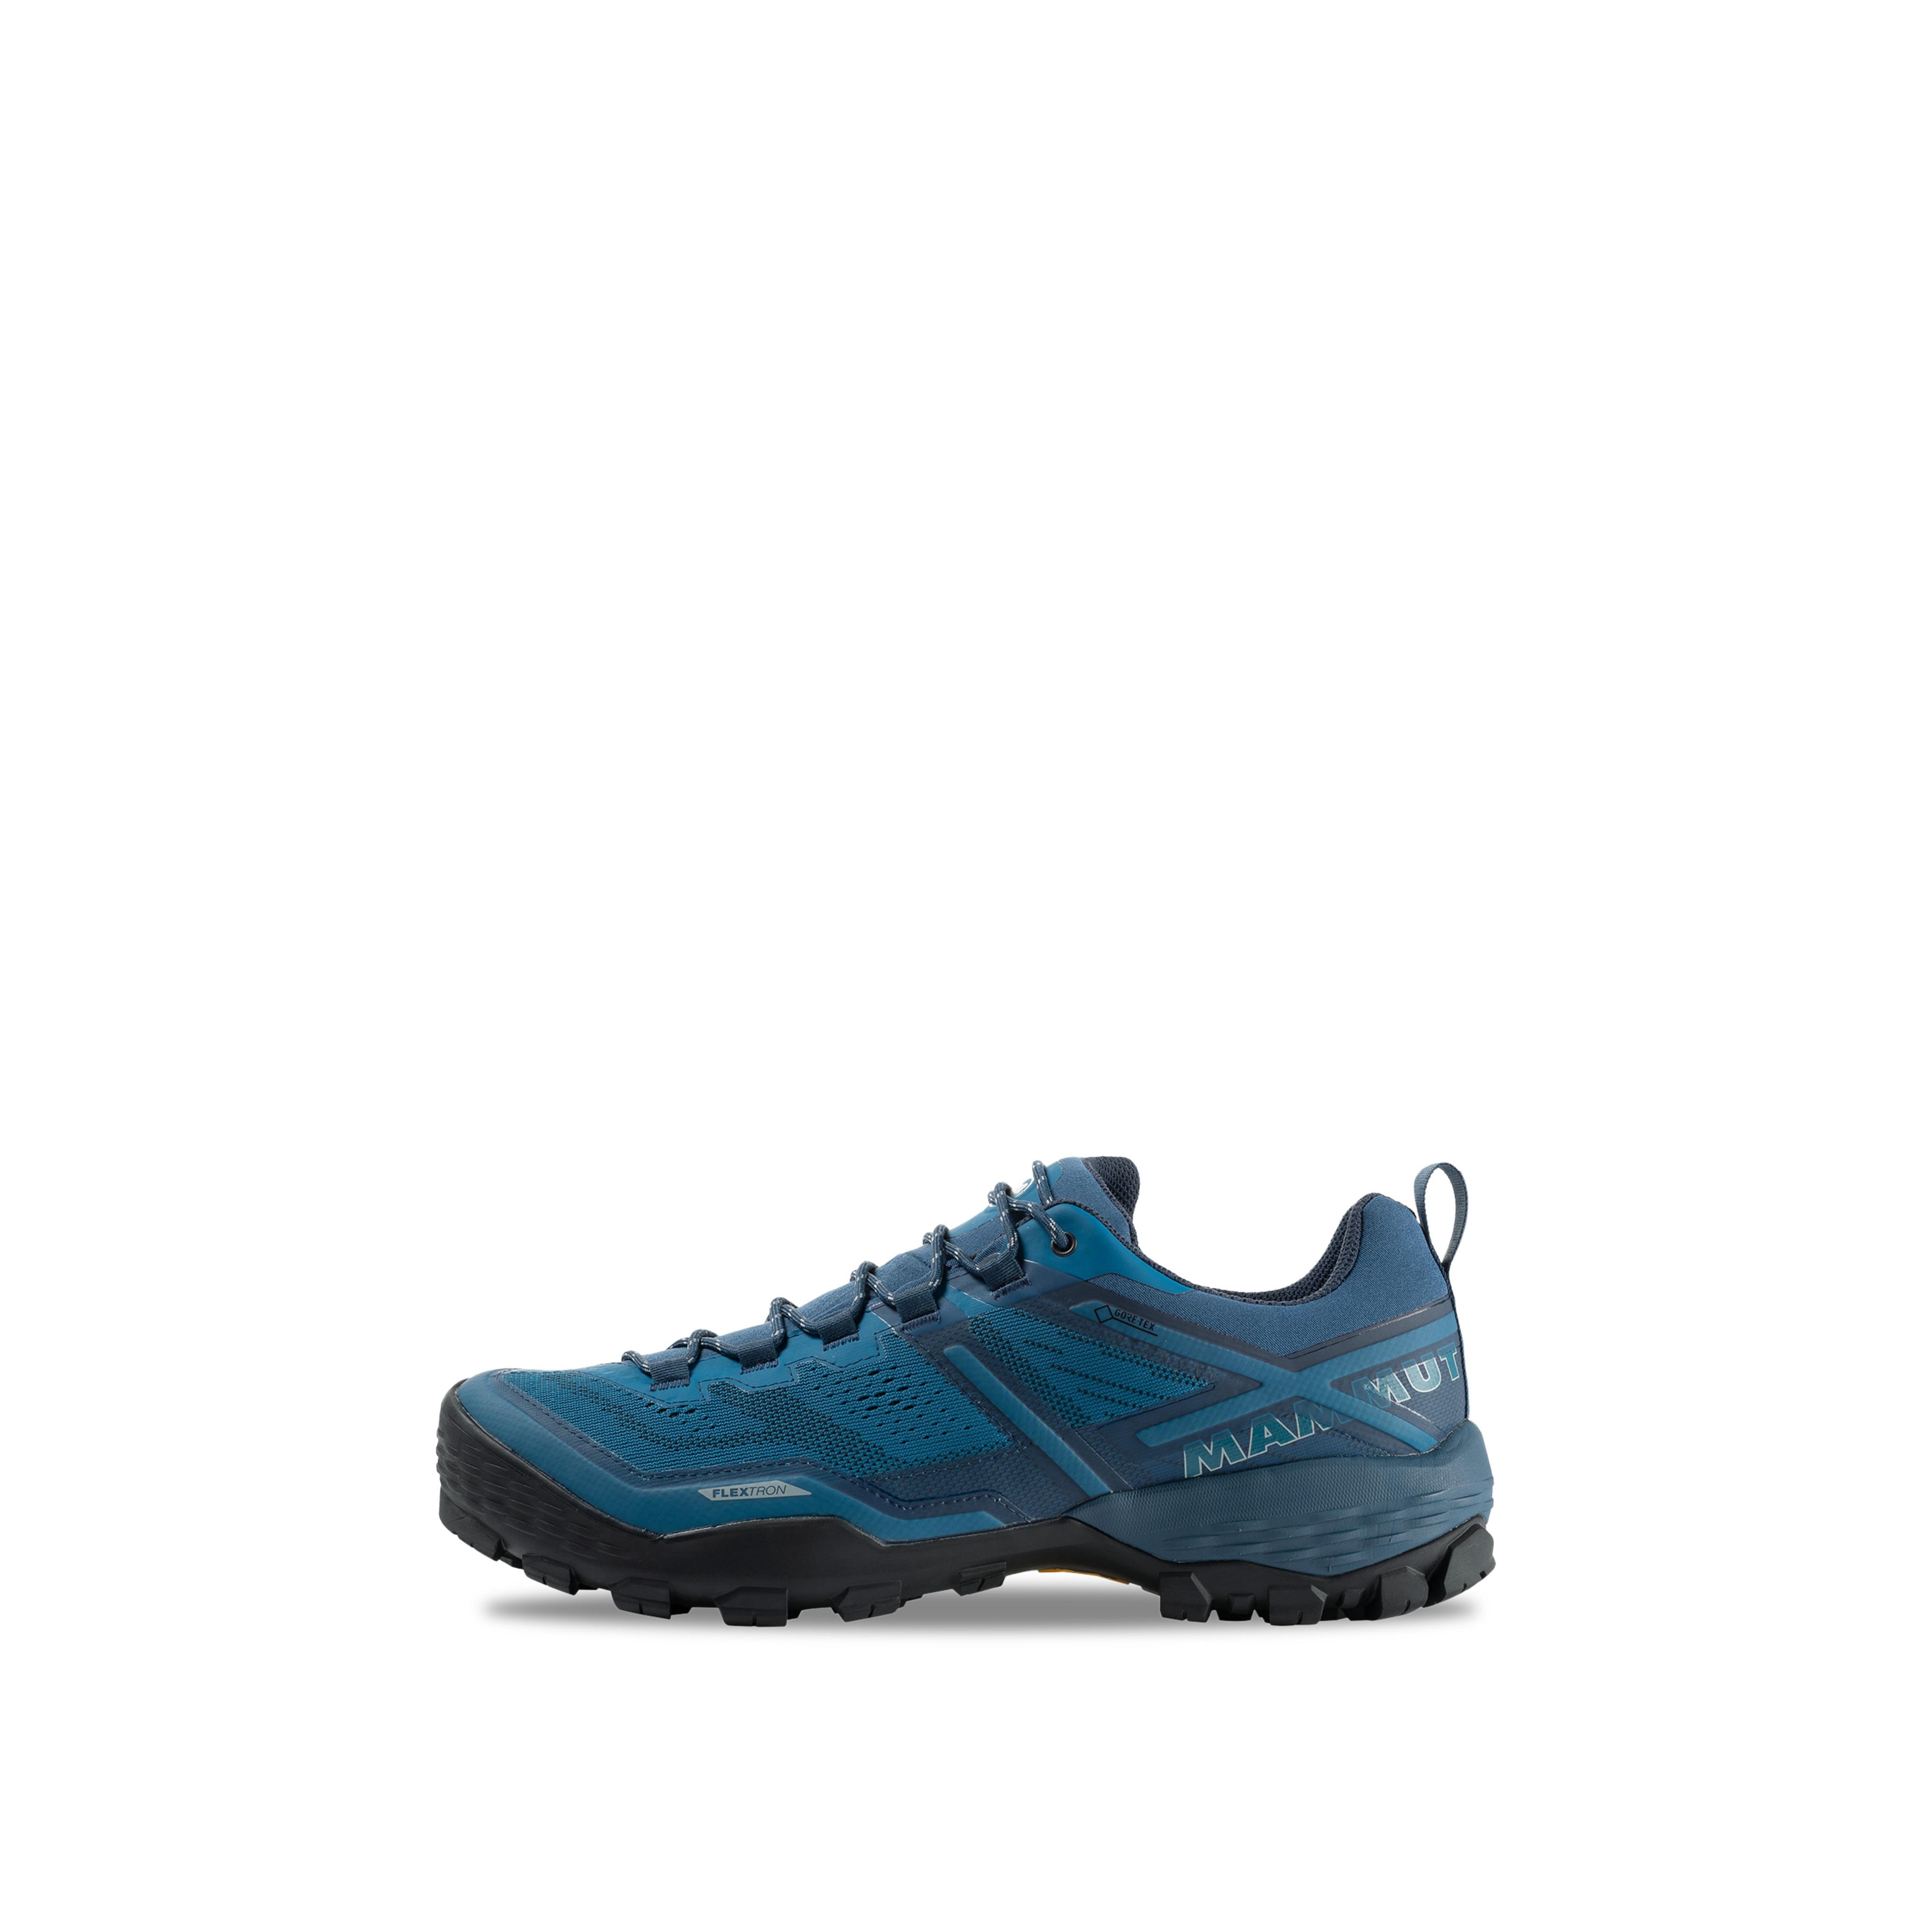 Ducan Low GTX® Men - sapphire-dark sapphire, UK 6.5 thumbnail